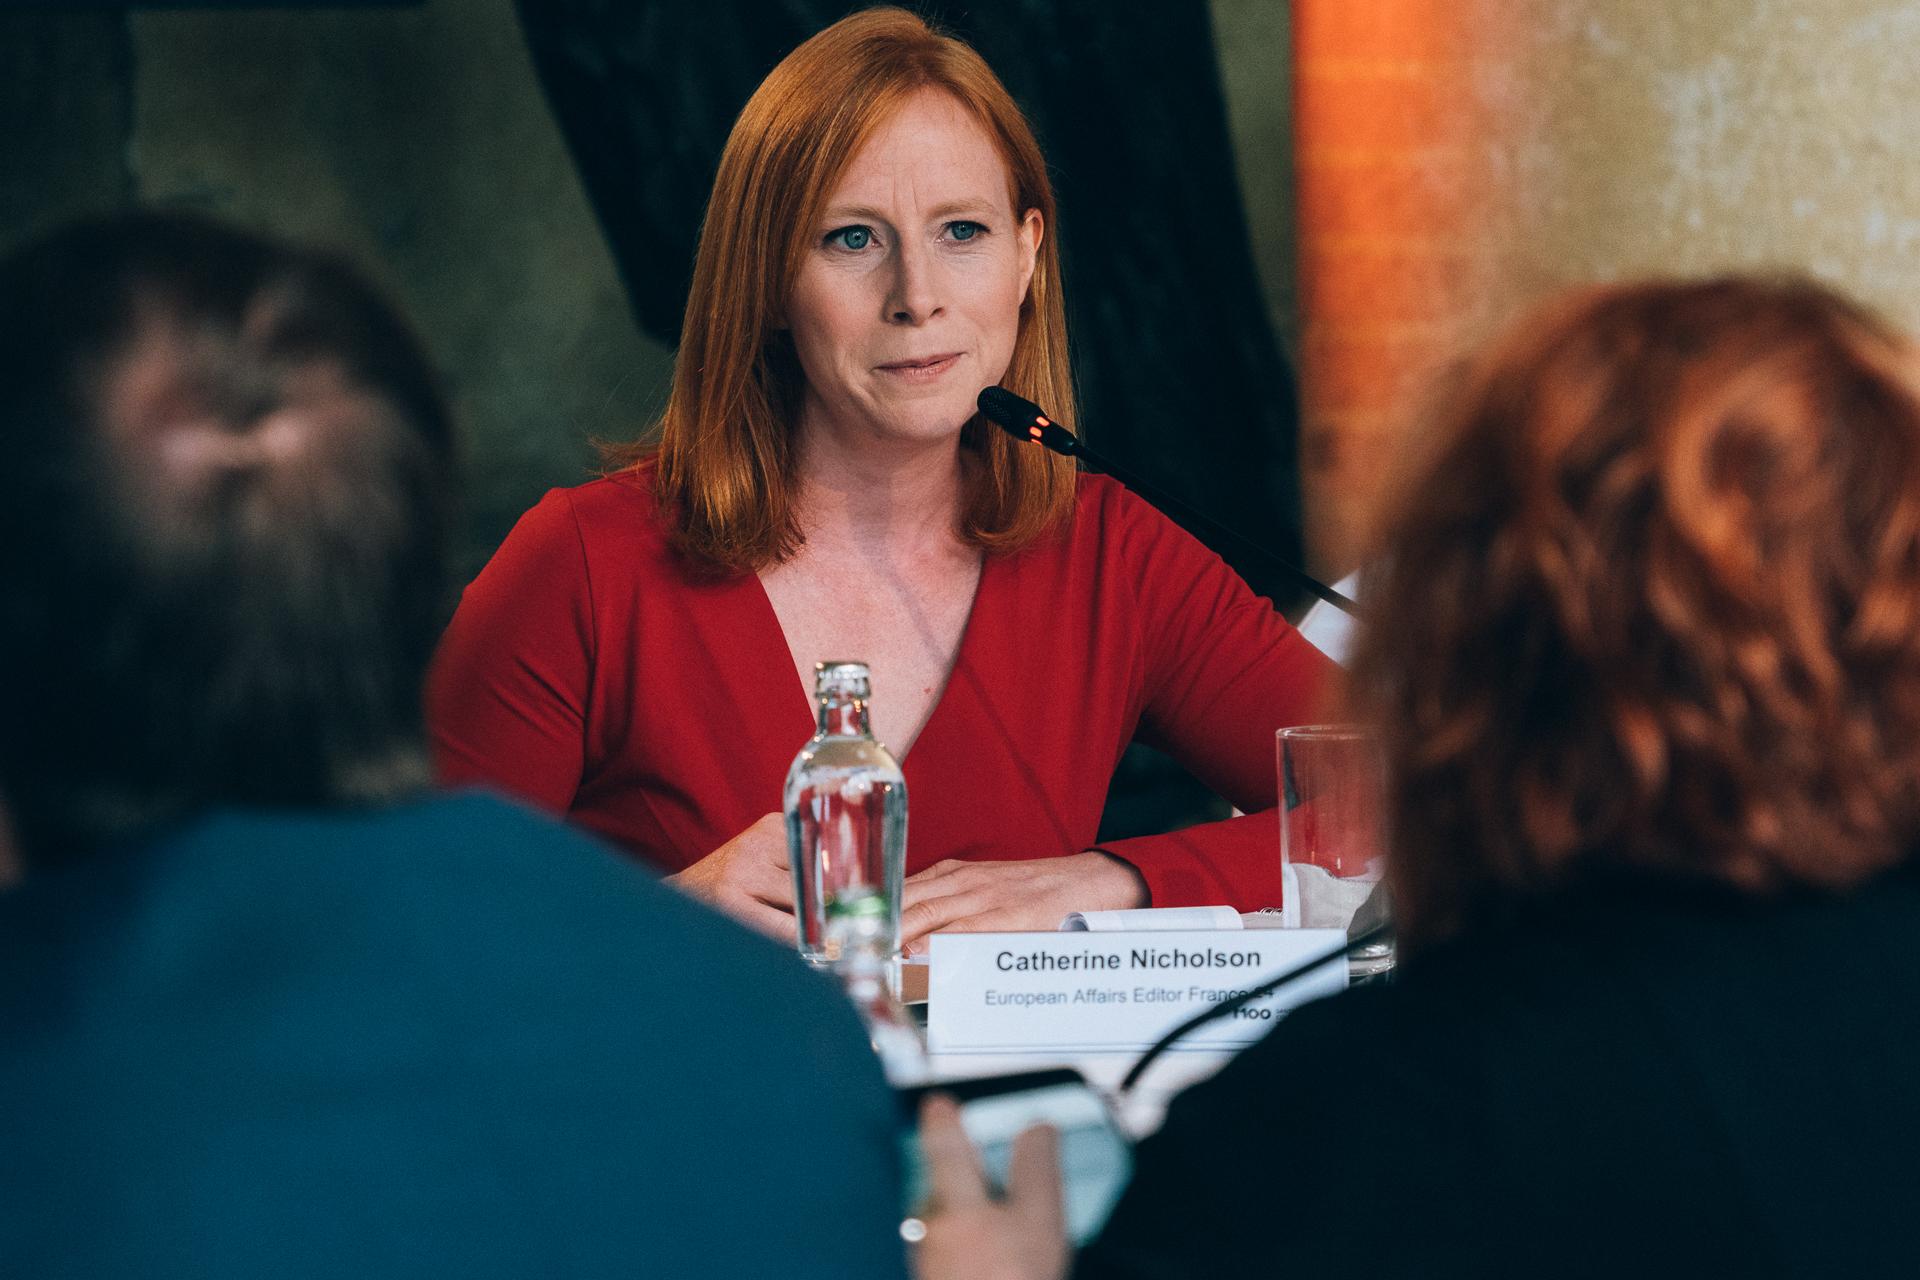 M100 Sanssouci Colloquium 2019 with Catherine Nicholson